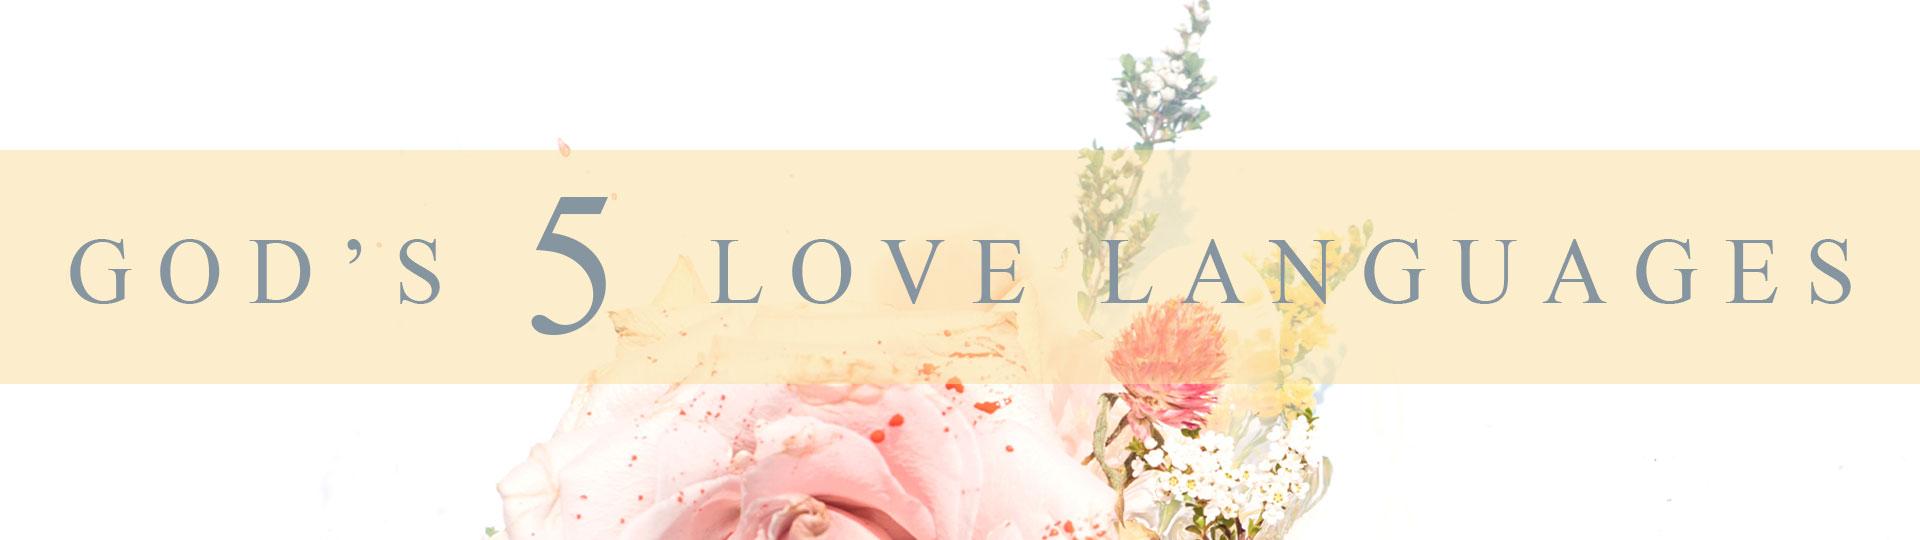 Gods-5-Love-Languages-blog-series.jpg